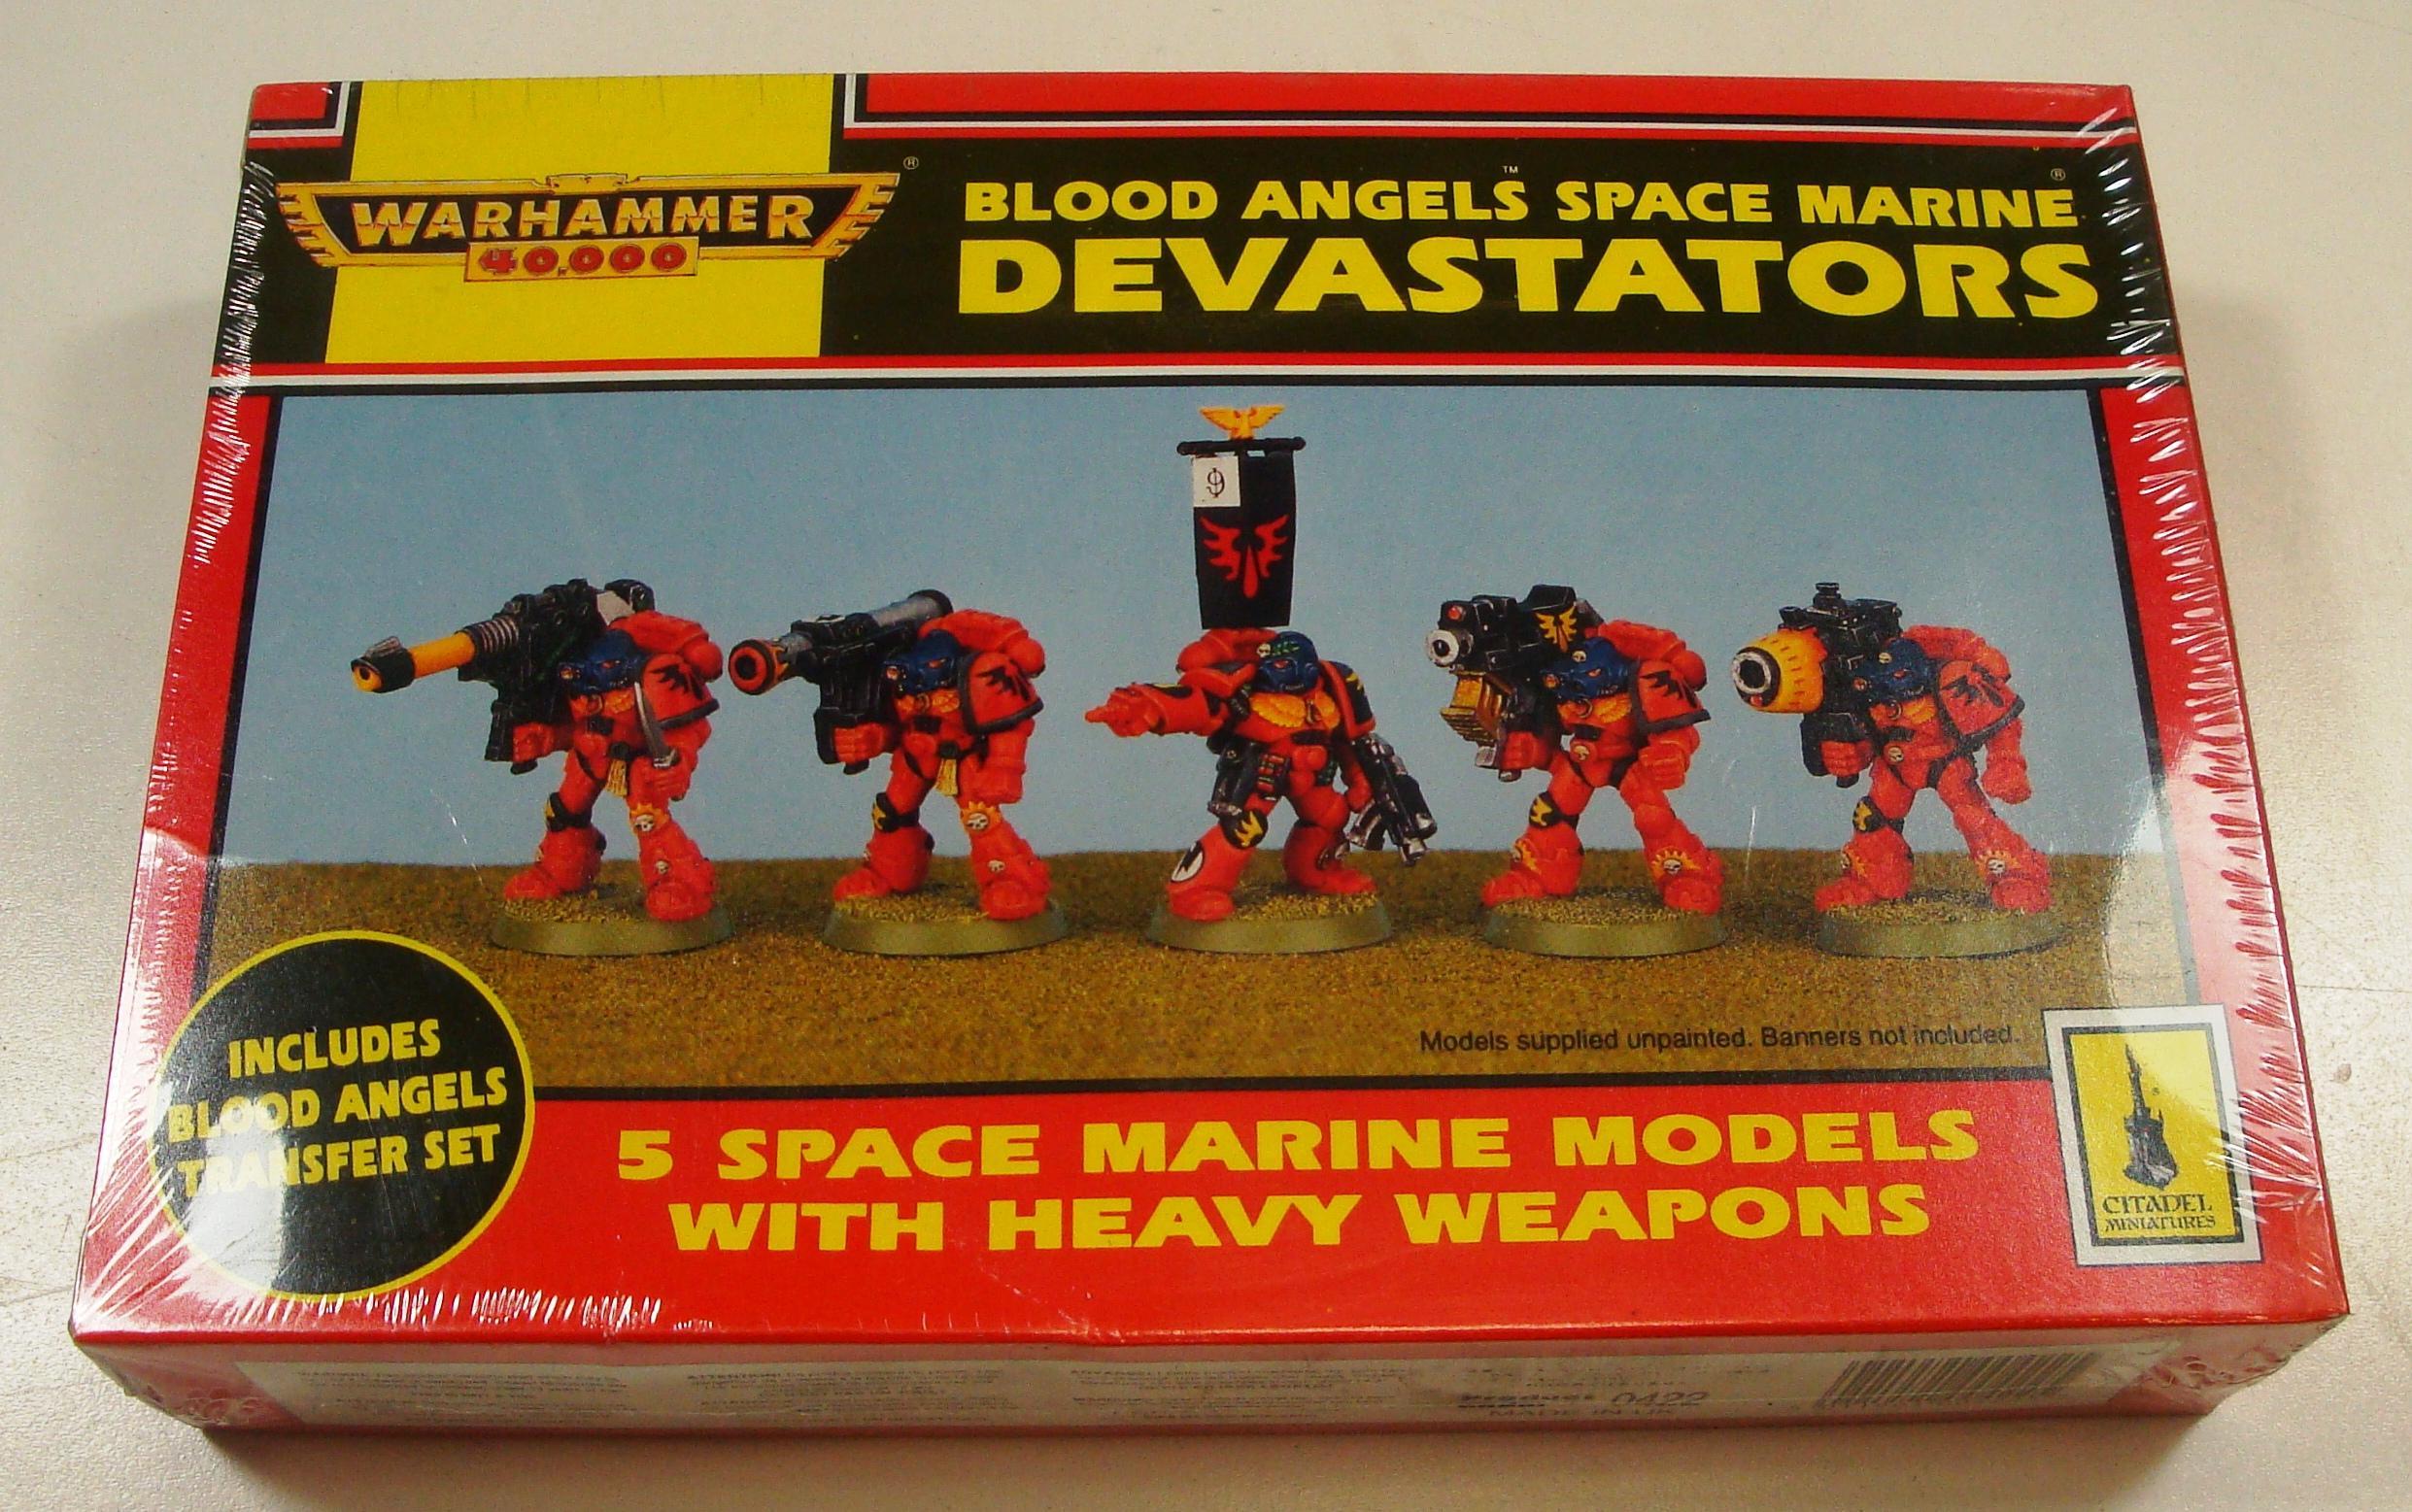 Adeptus Astartes, Astartes, Blood Angels, Devastator, Dreadnought, Imperial Fists, Predator, Razorback, Rhino, Rogue Trader, Sale, Space Marines, Whirlwind